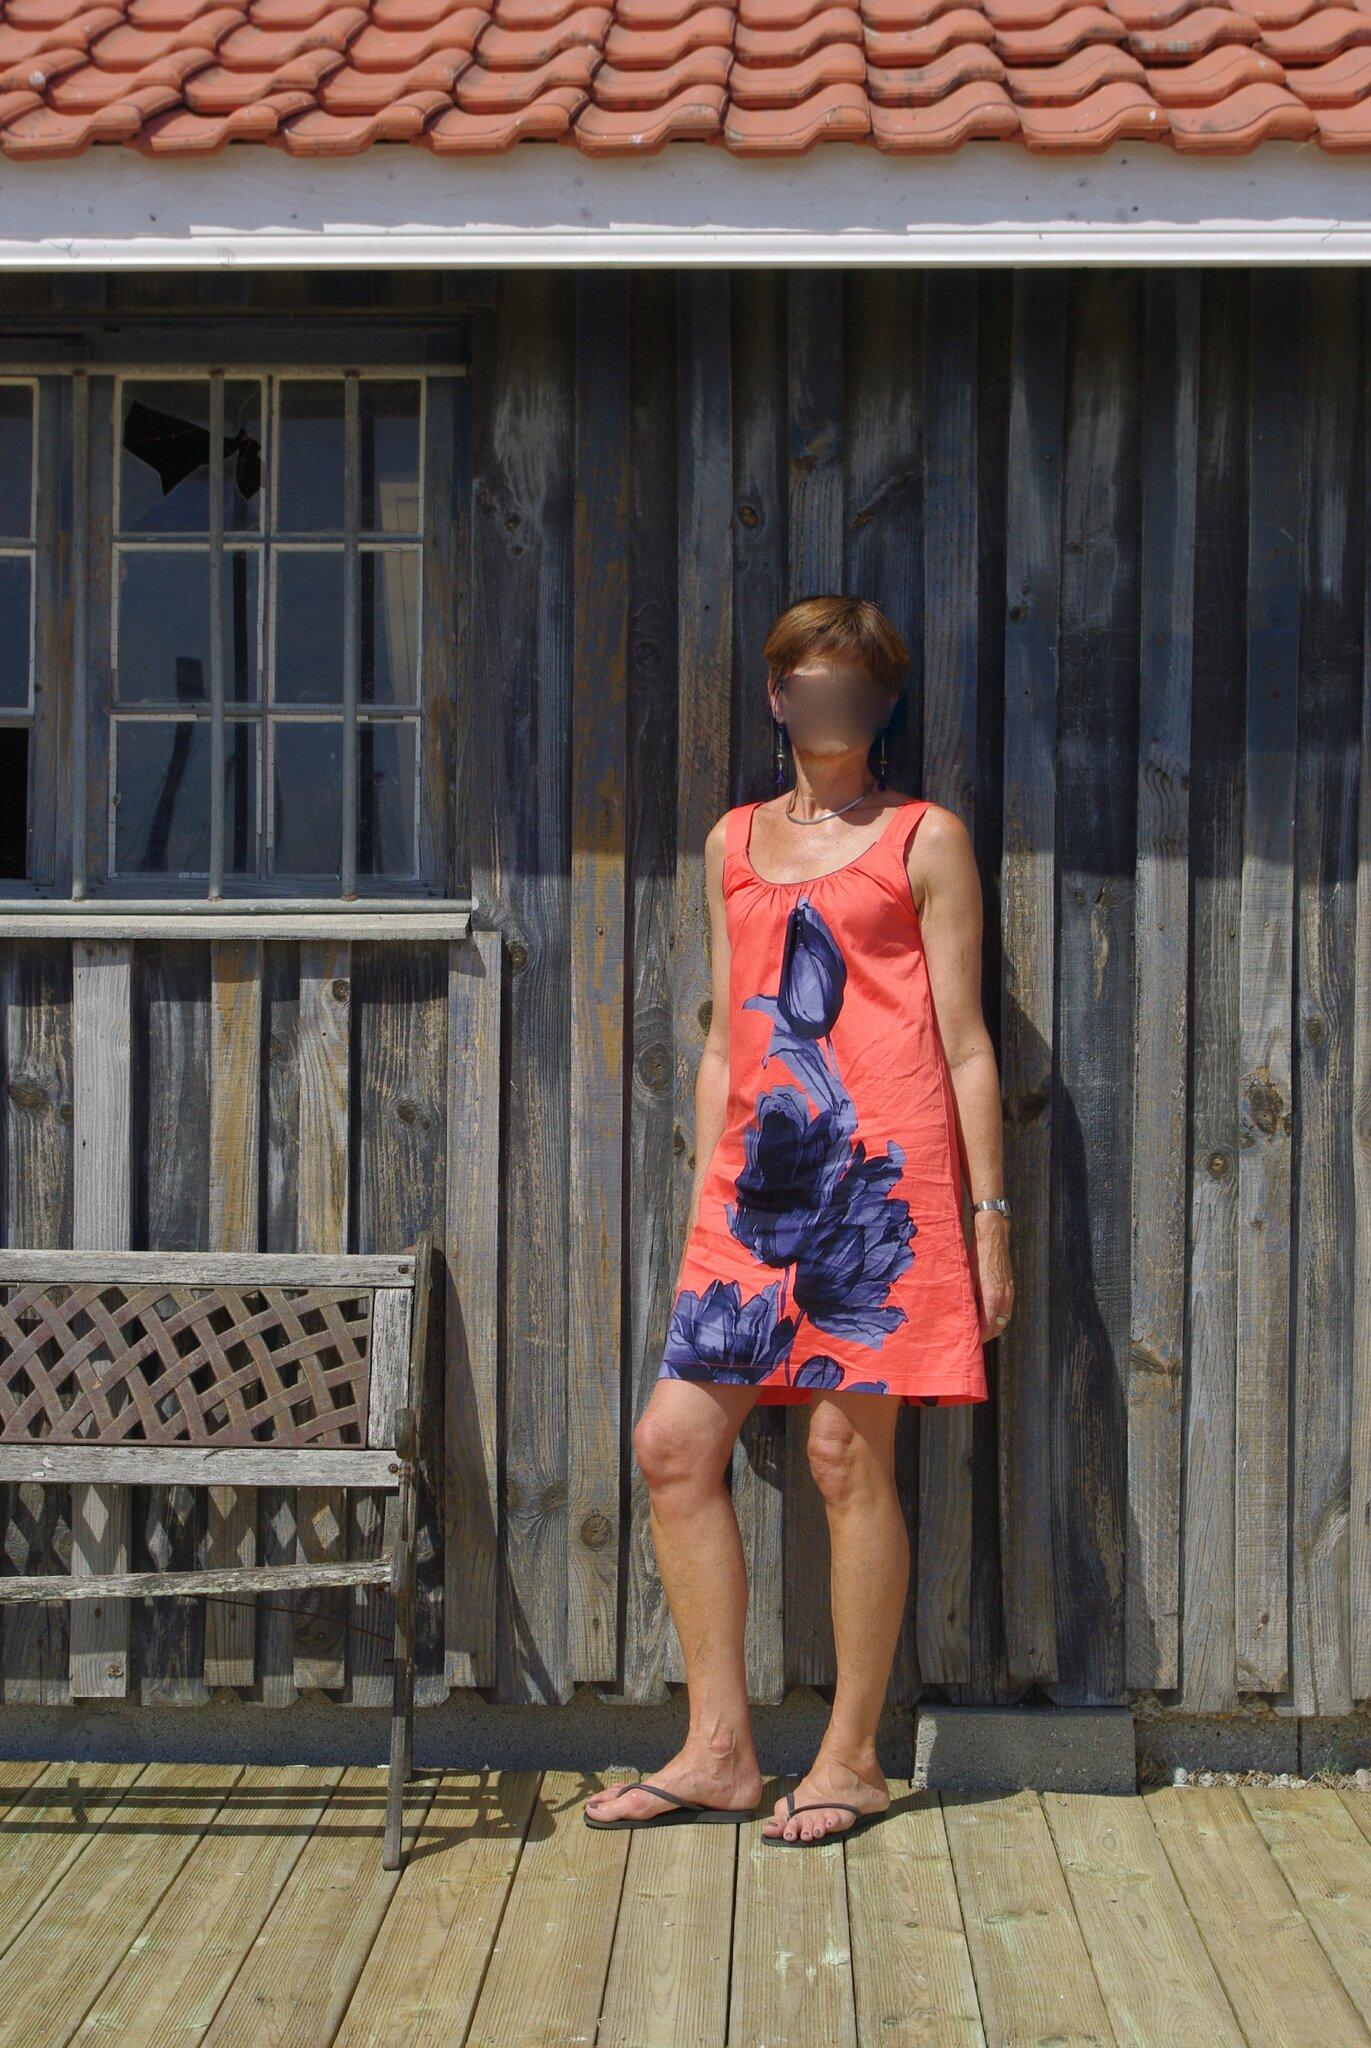 LA robe d'été : Burda 161 de mai 2013, robe102